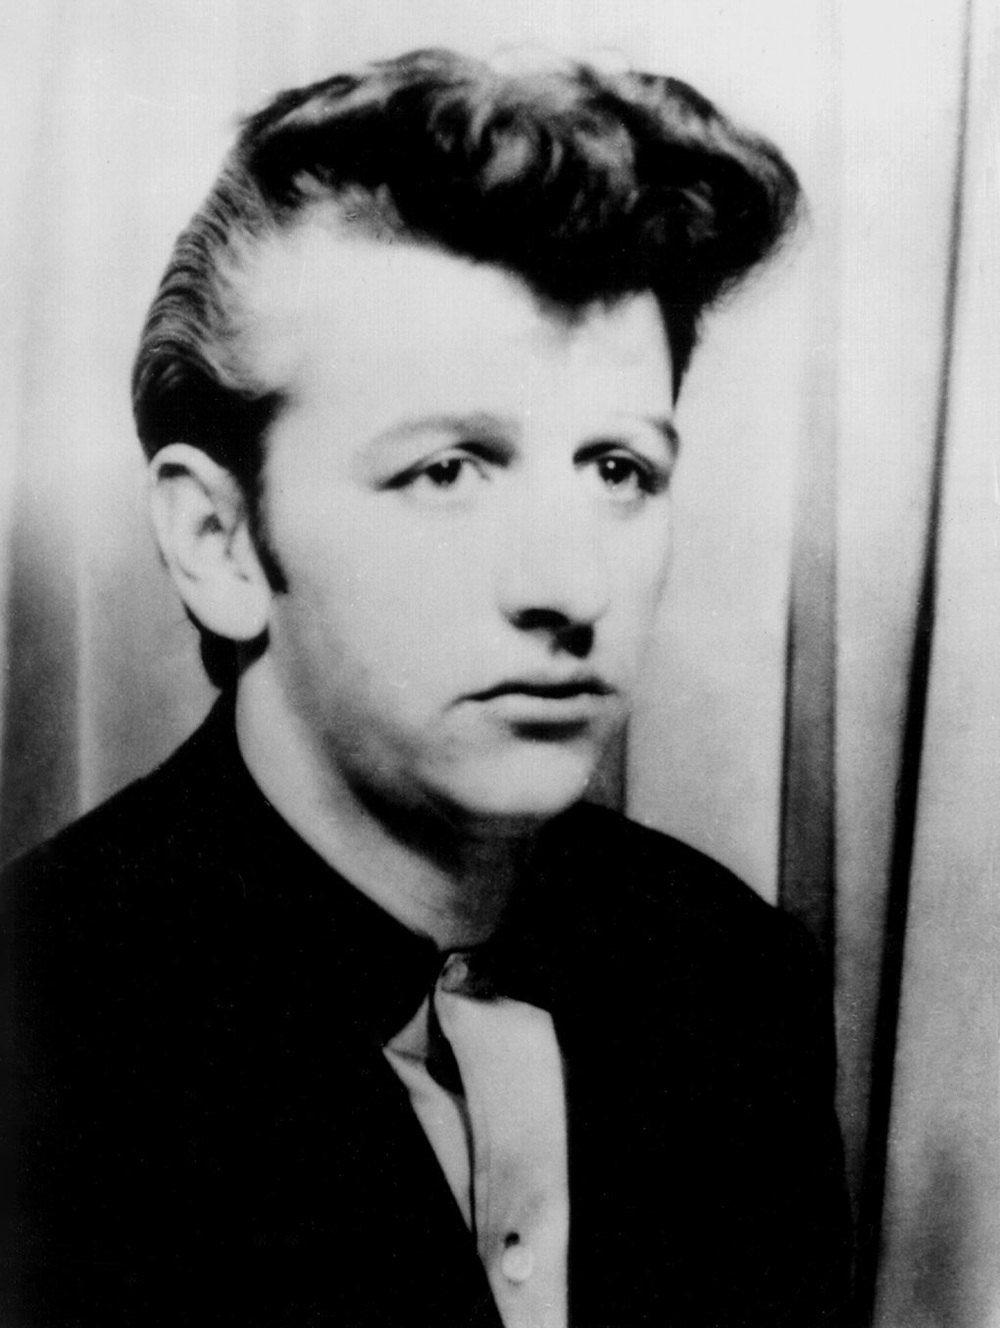 Ringo Starr circa 1960.